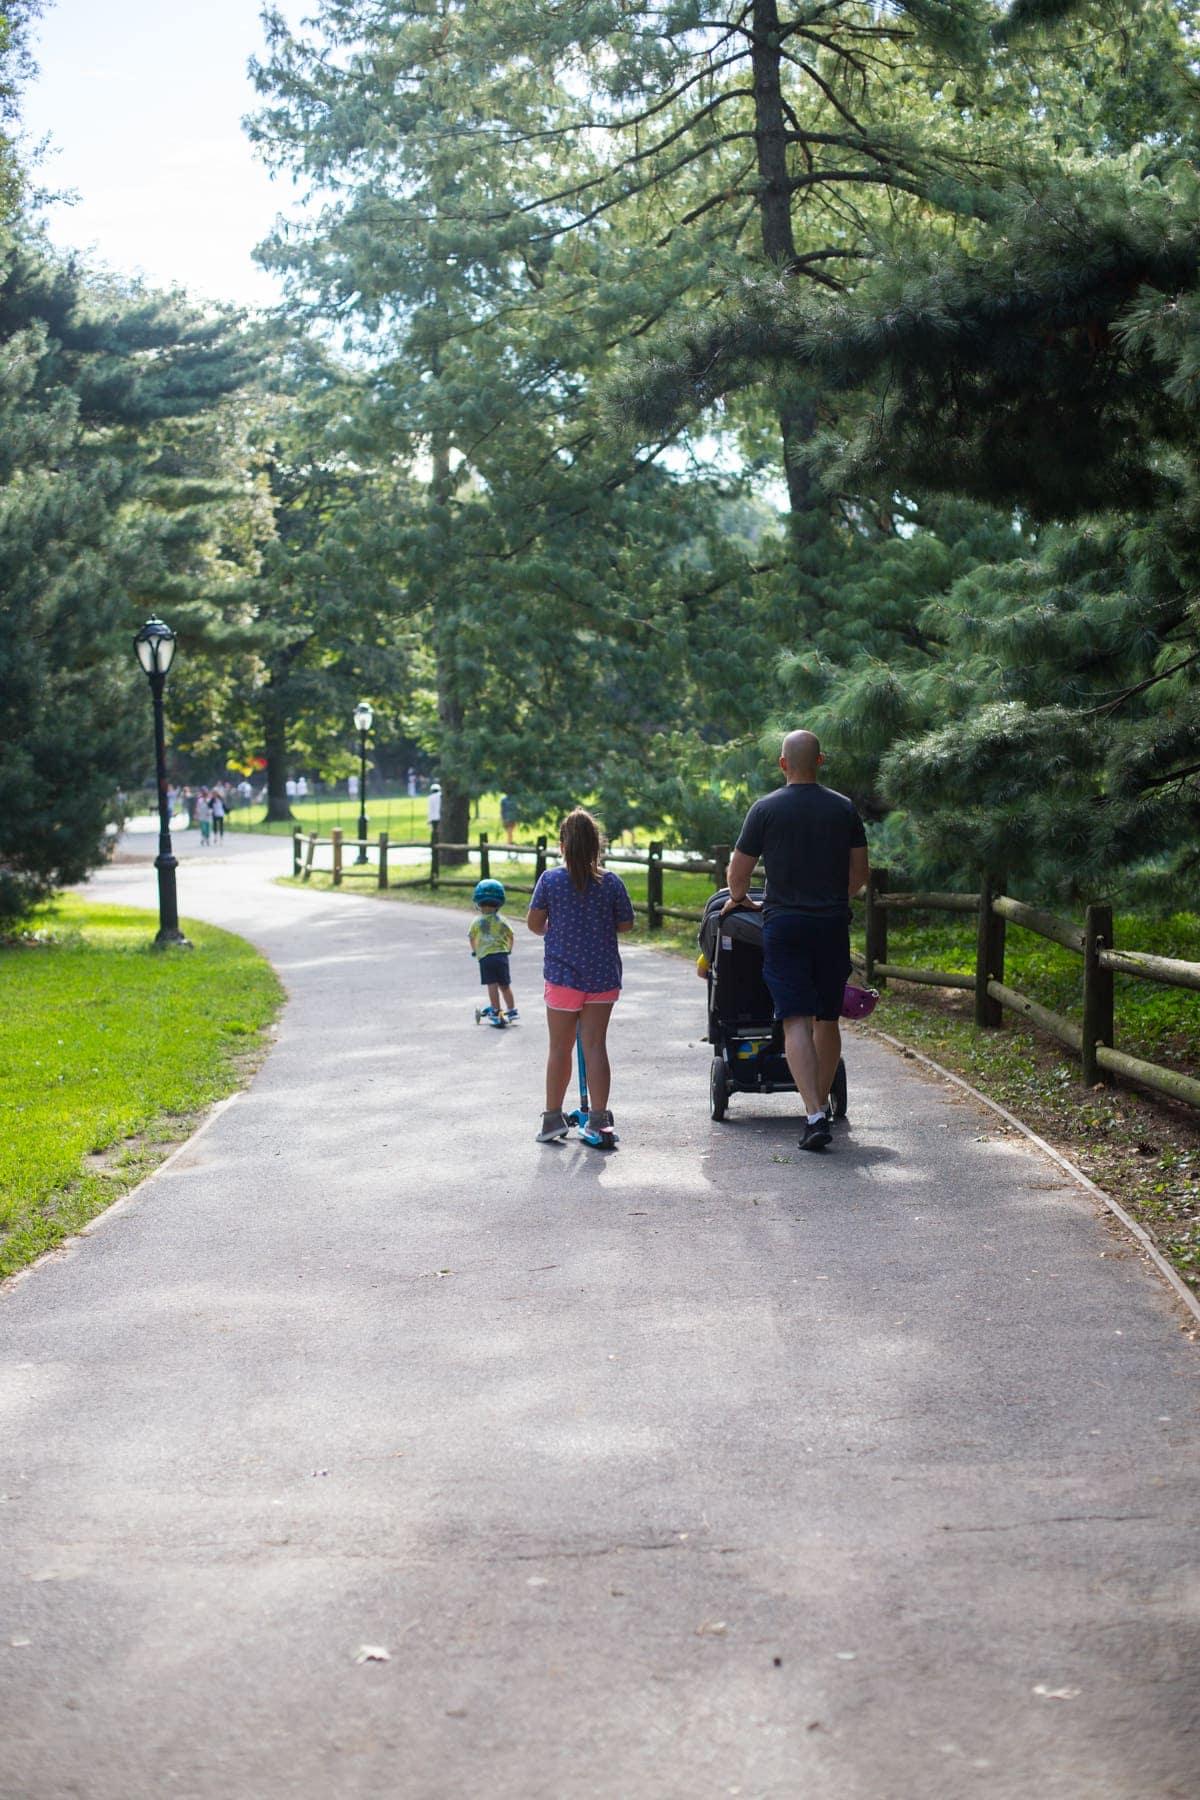 Gordon and the kids down a path